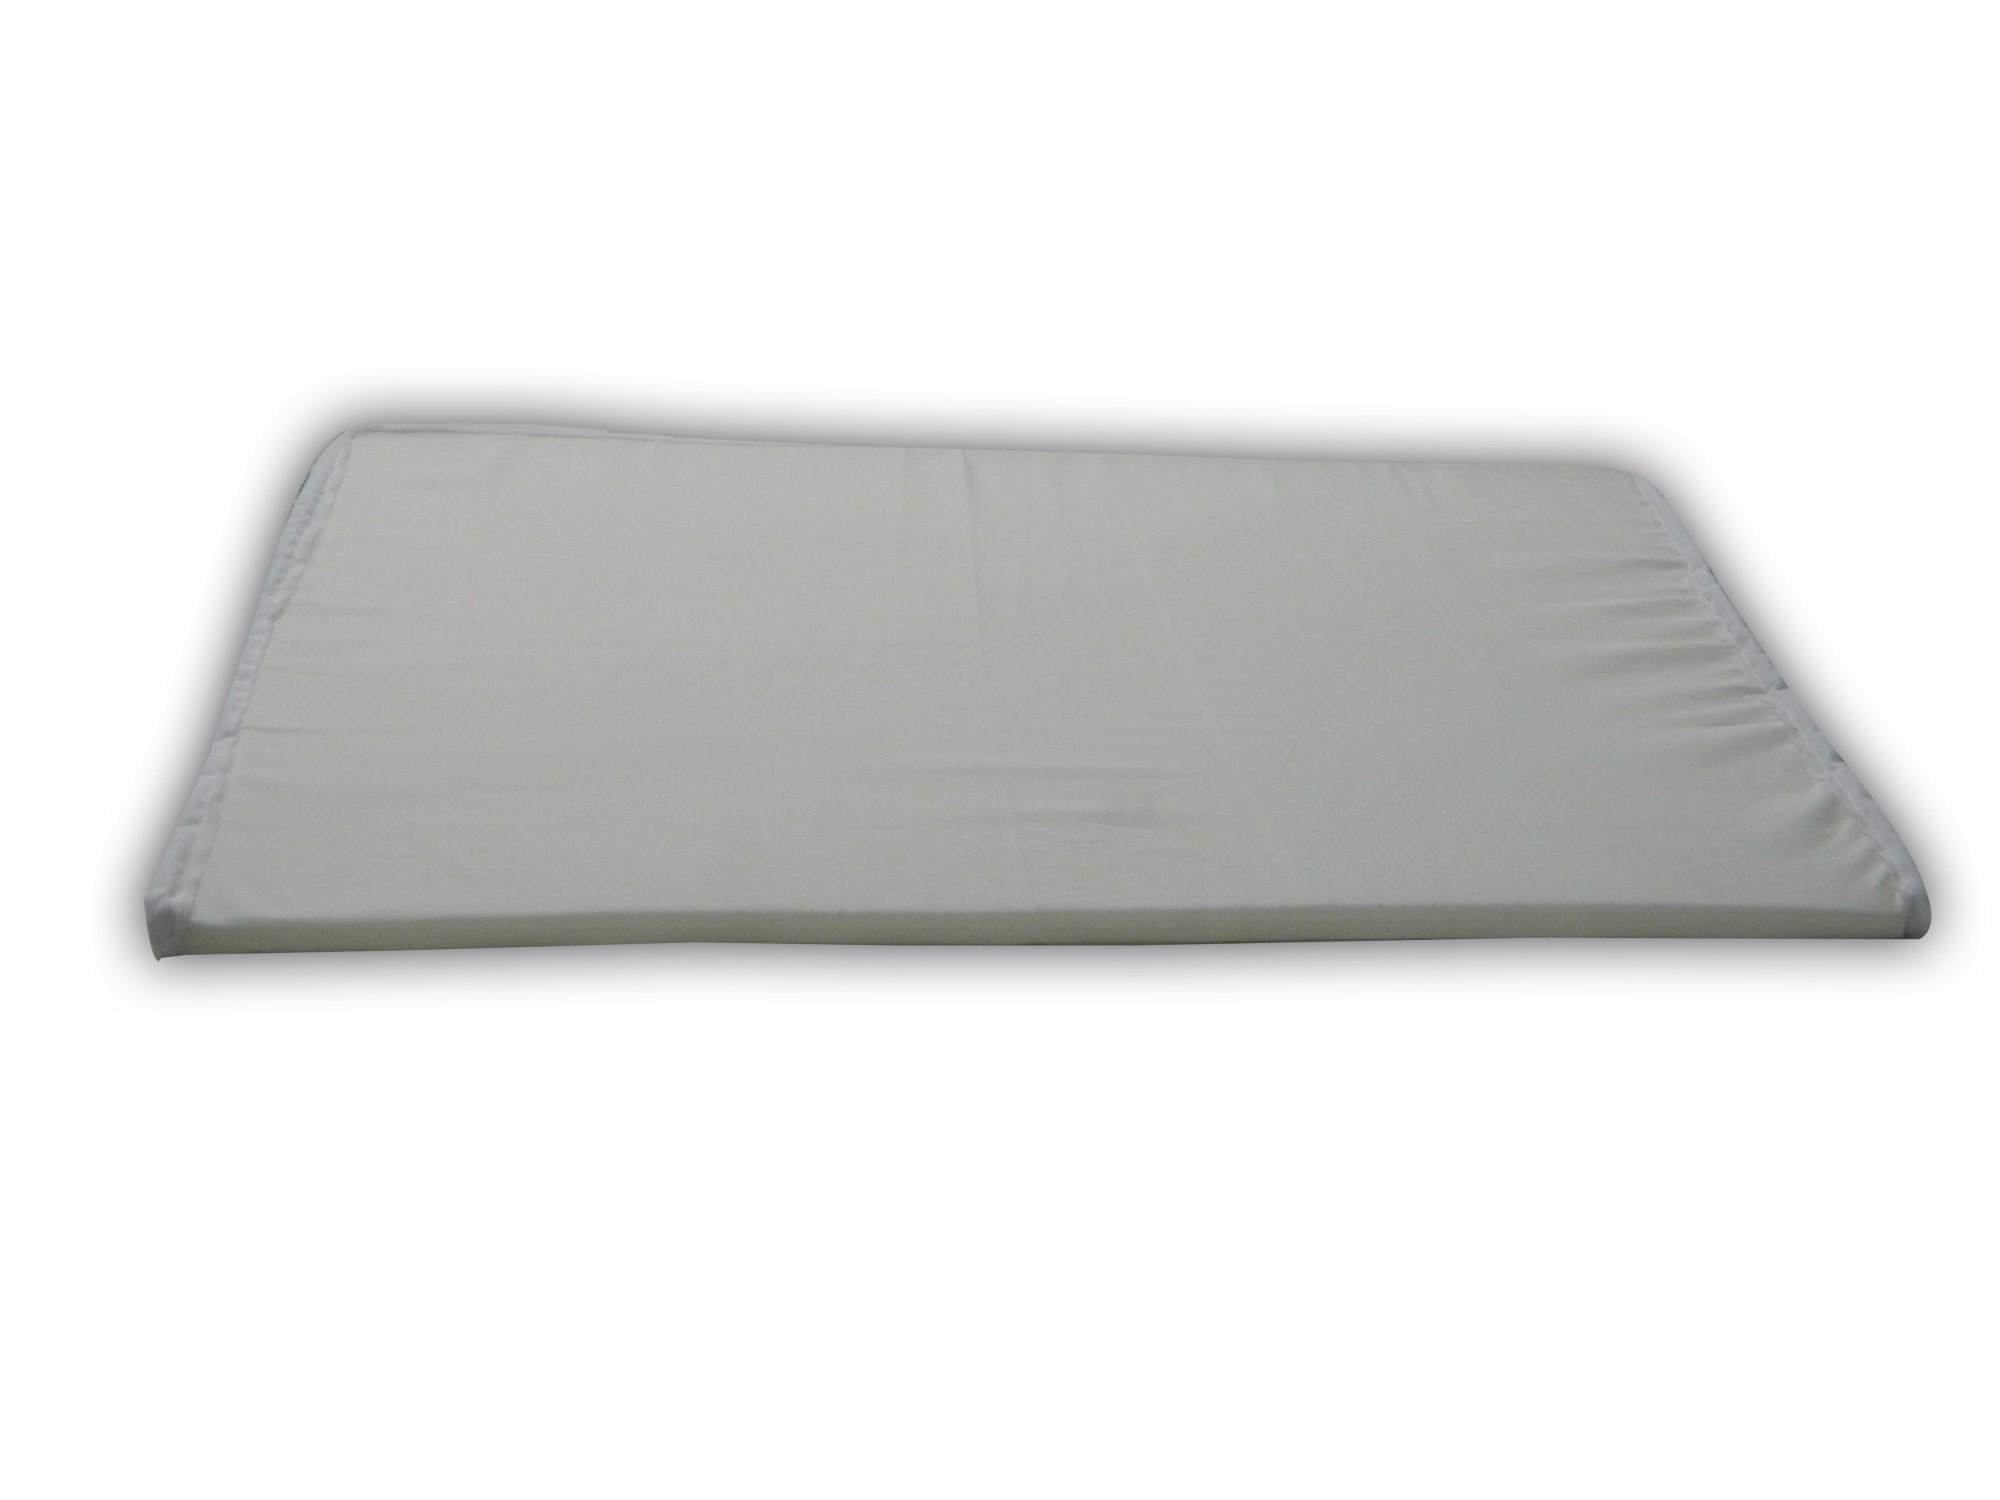 traversin 90 cm traversin plat cm bio en latex naturel with traversin 90 cm trendy traversin. Black Bedroom Furniture Sets. Home Design Ideas